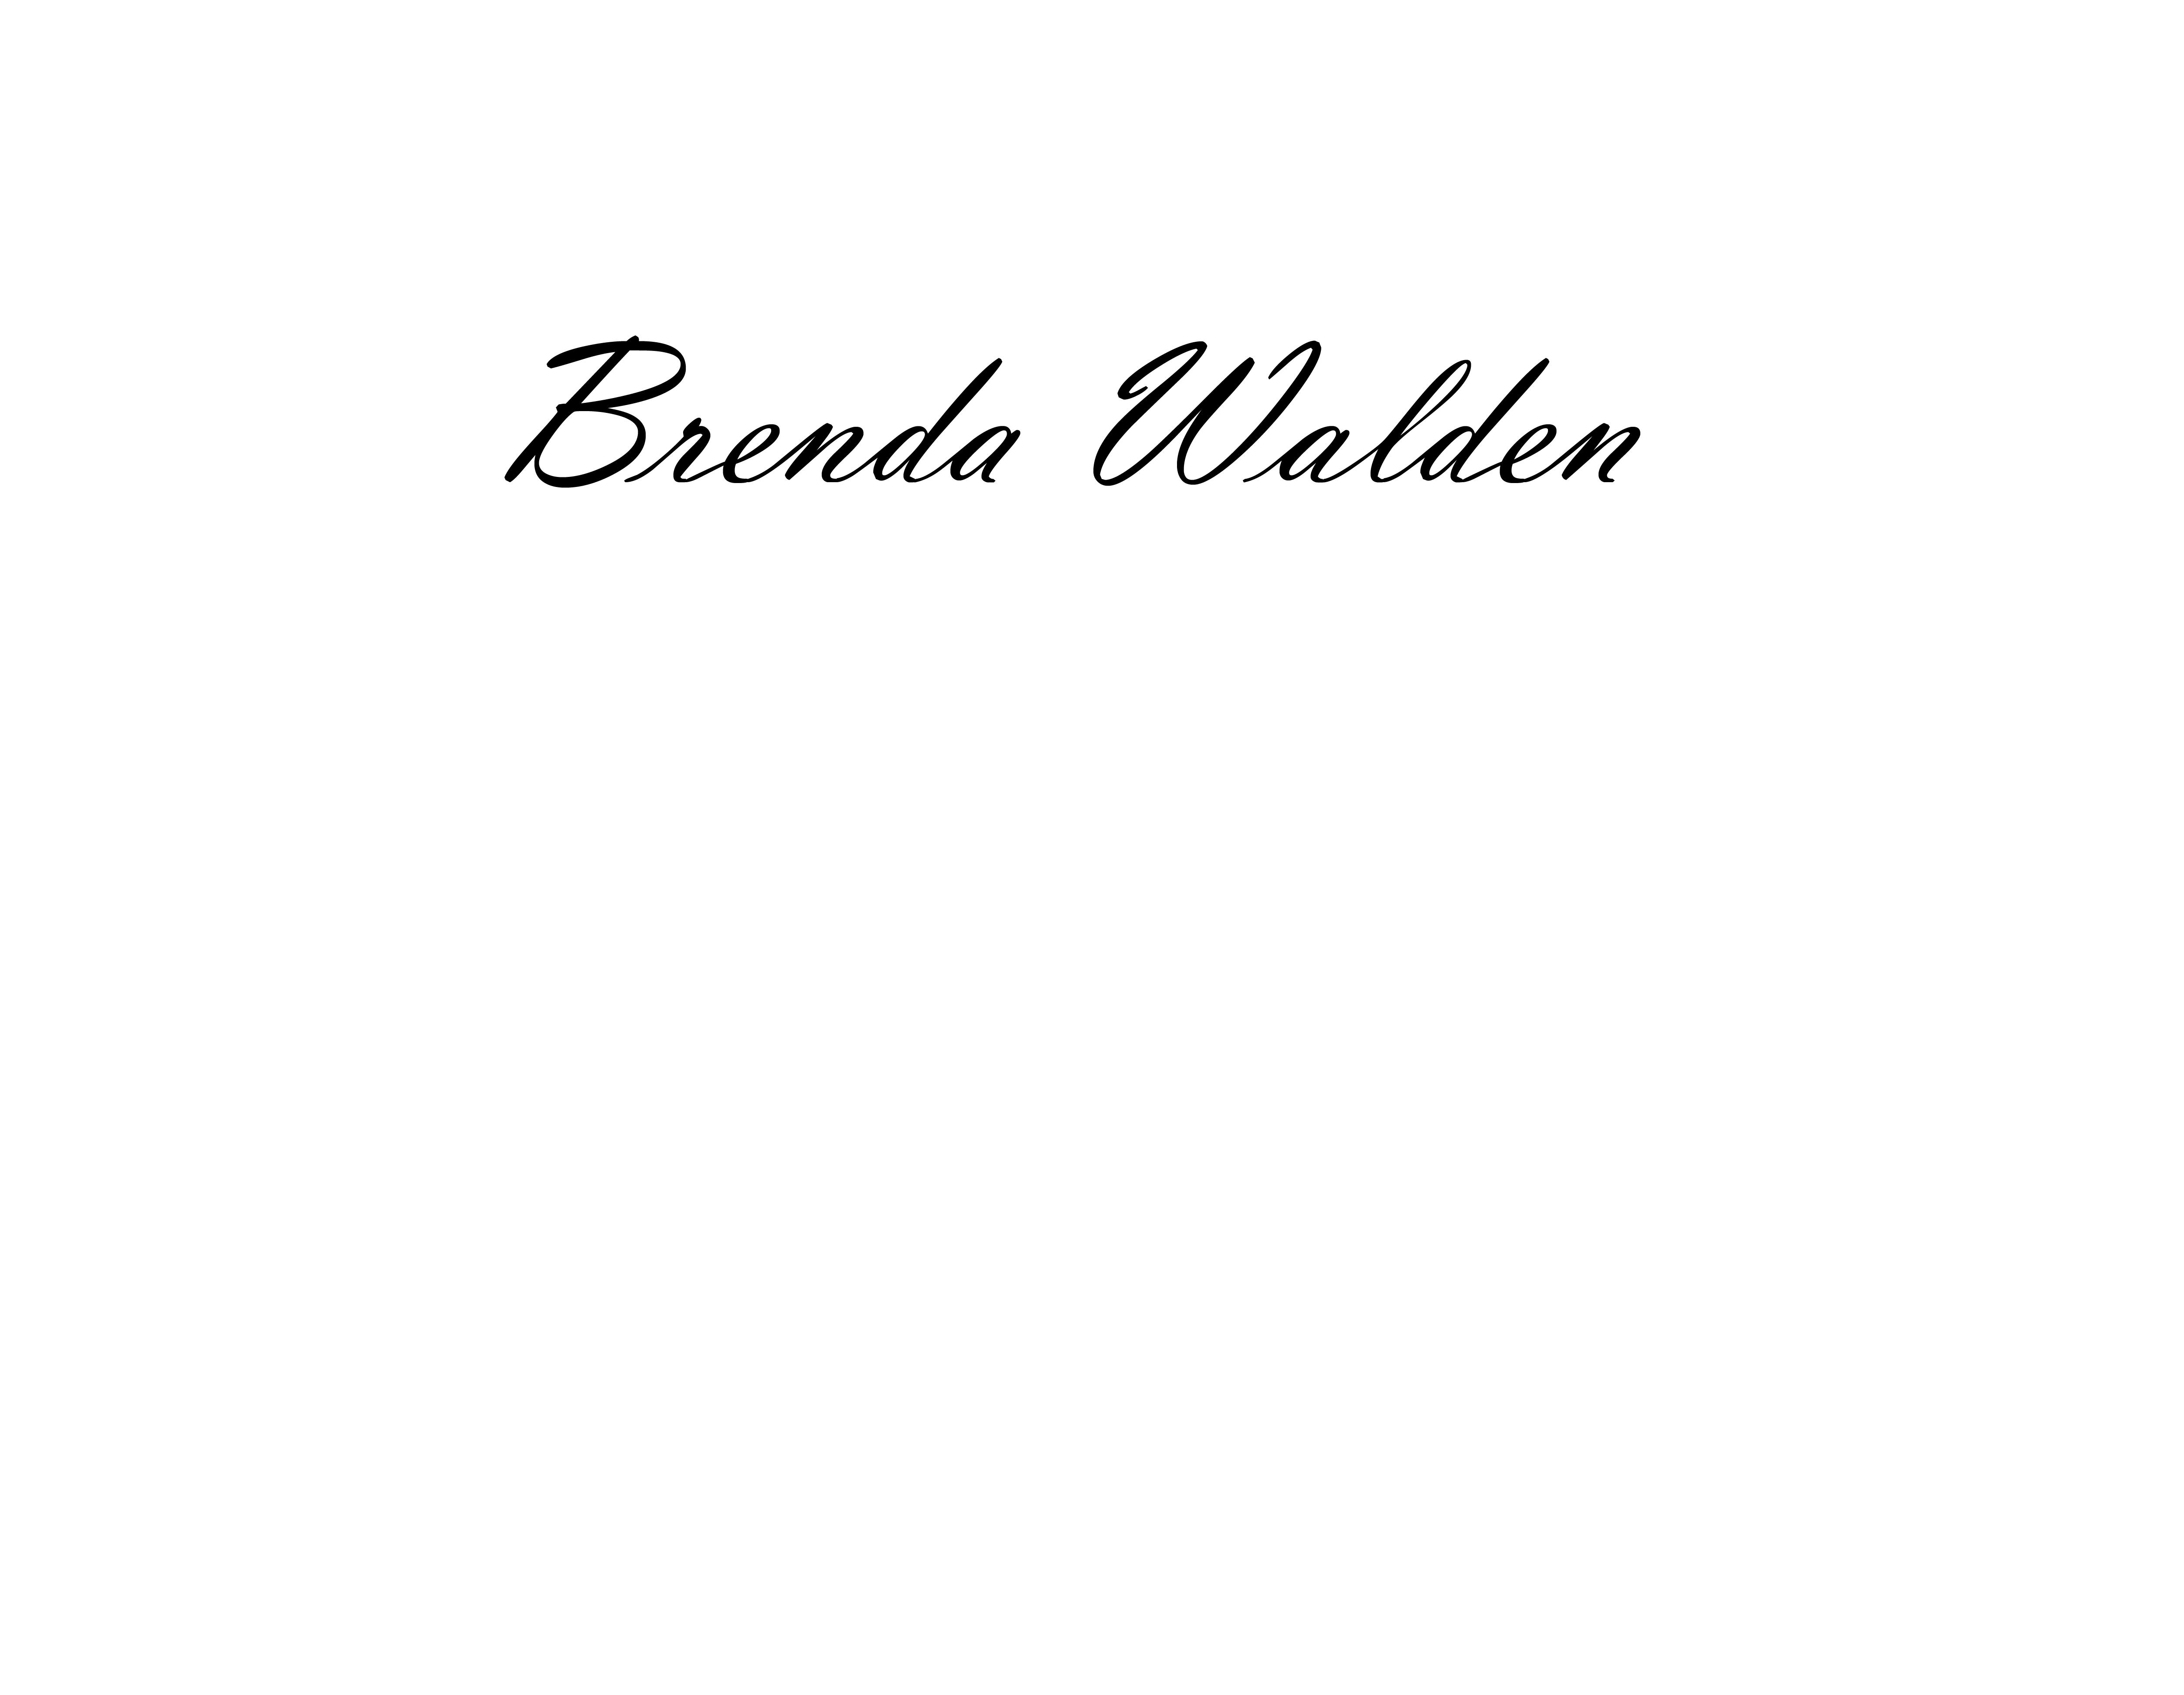 Brenda Walden Signature